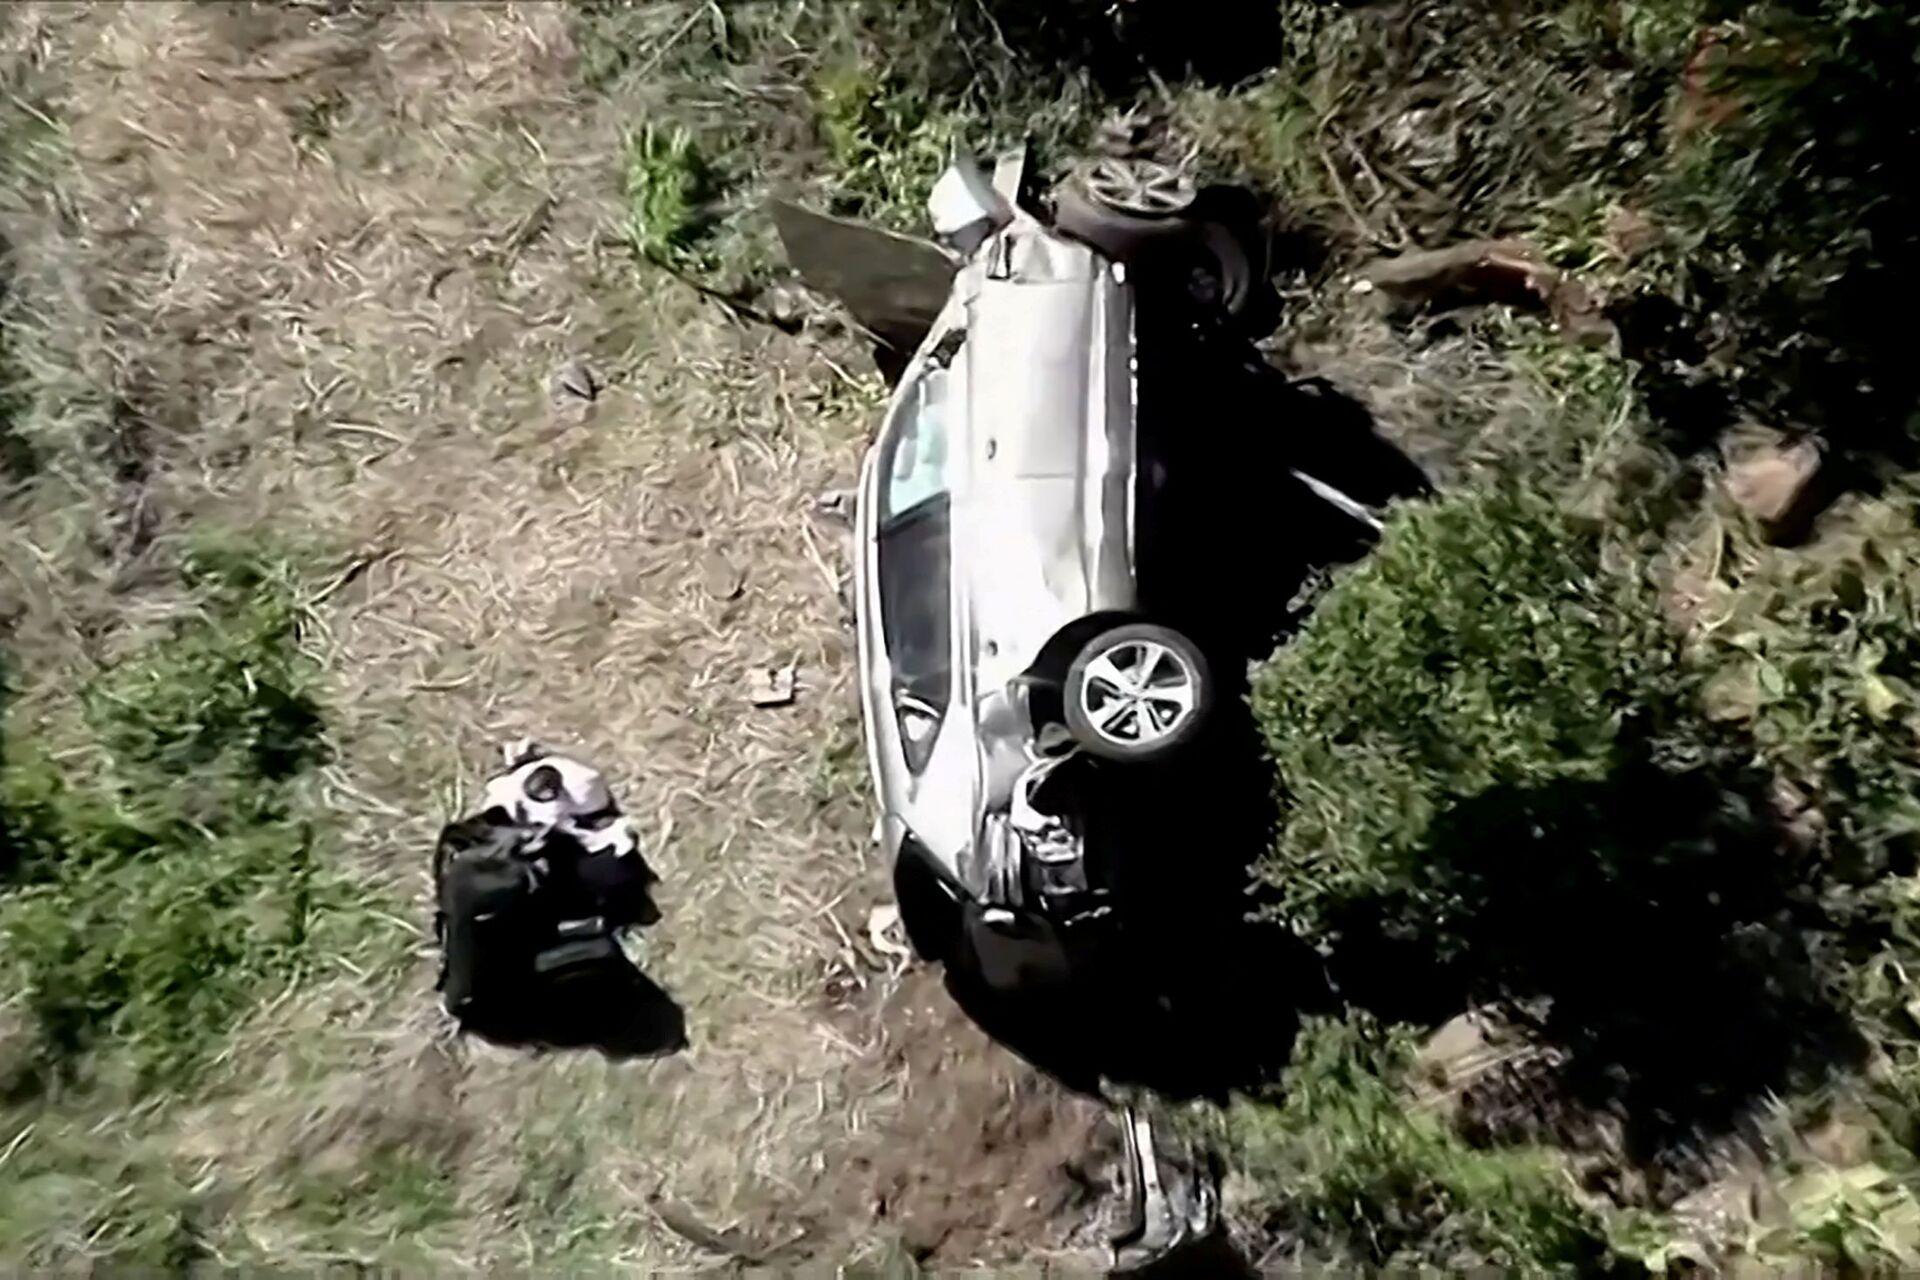 Tiger Woods Car Crash: A Recap of the Golf Legend's Ups and Downs - Sputnik International, 1920, 24.02.2021